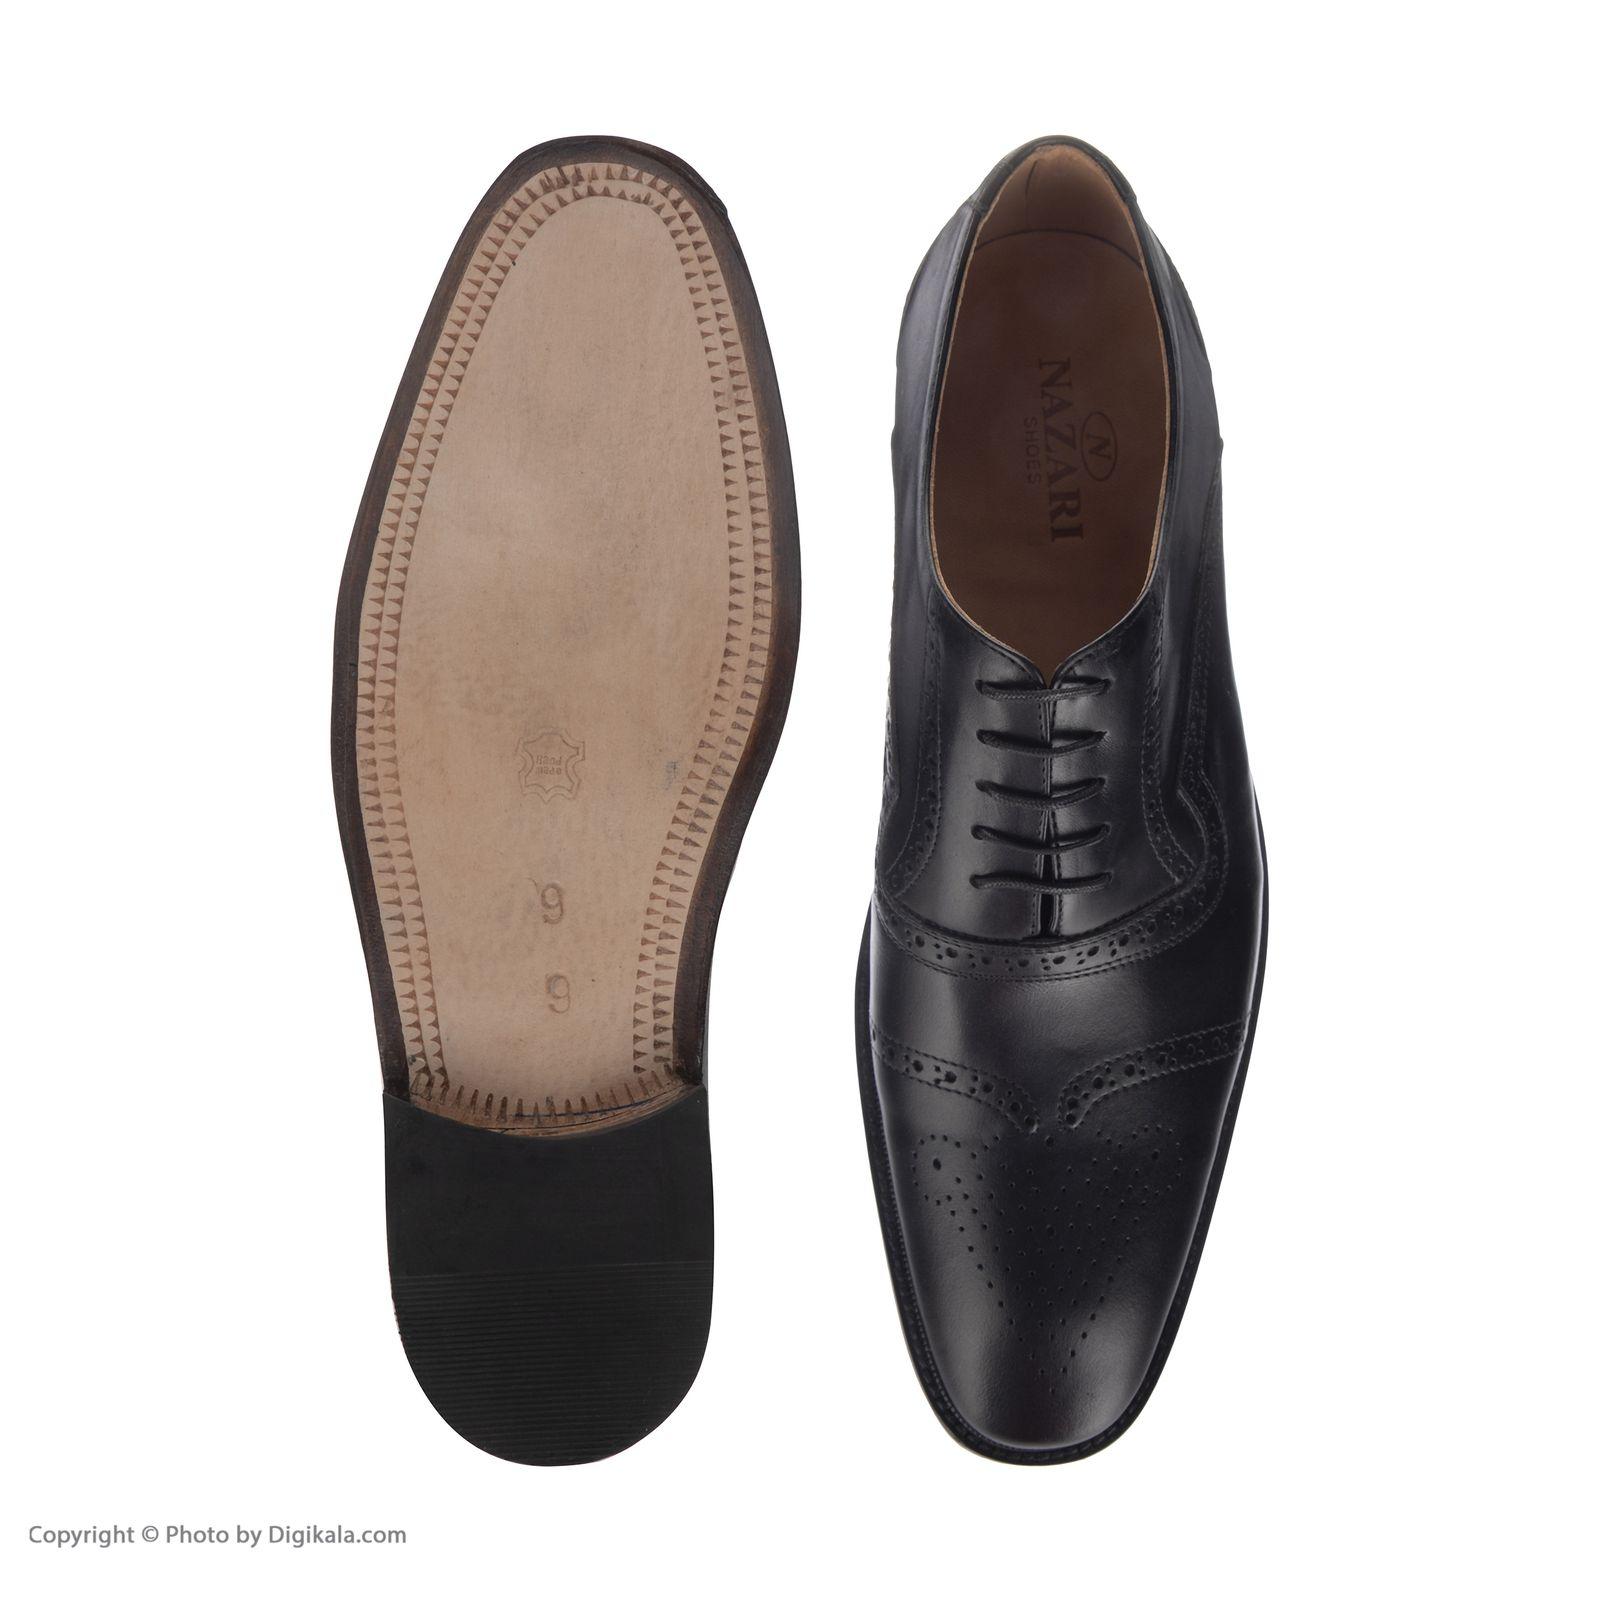 کفش مردانه نظری کد 433 -  - 3